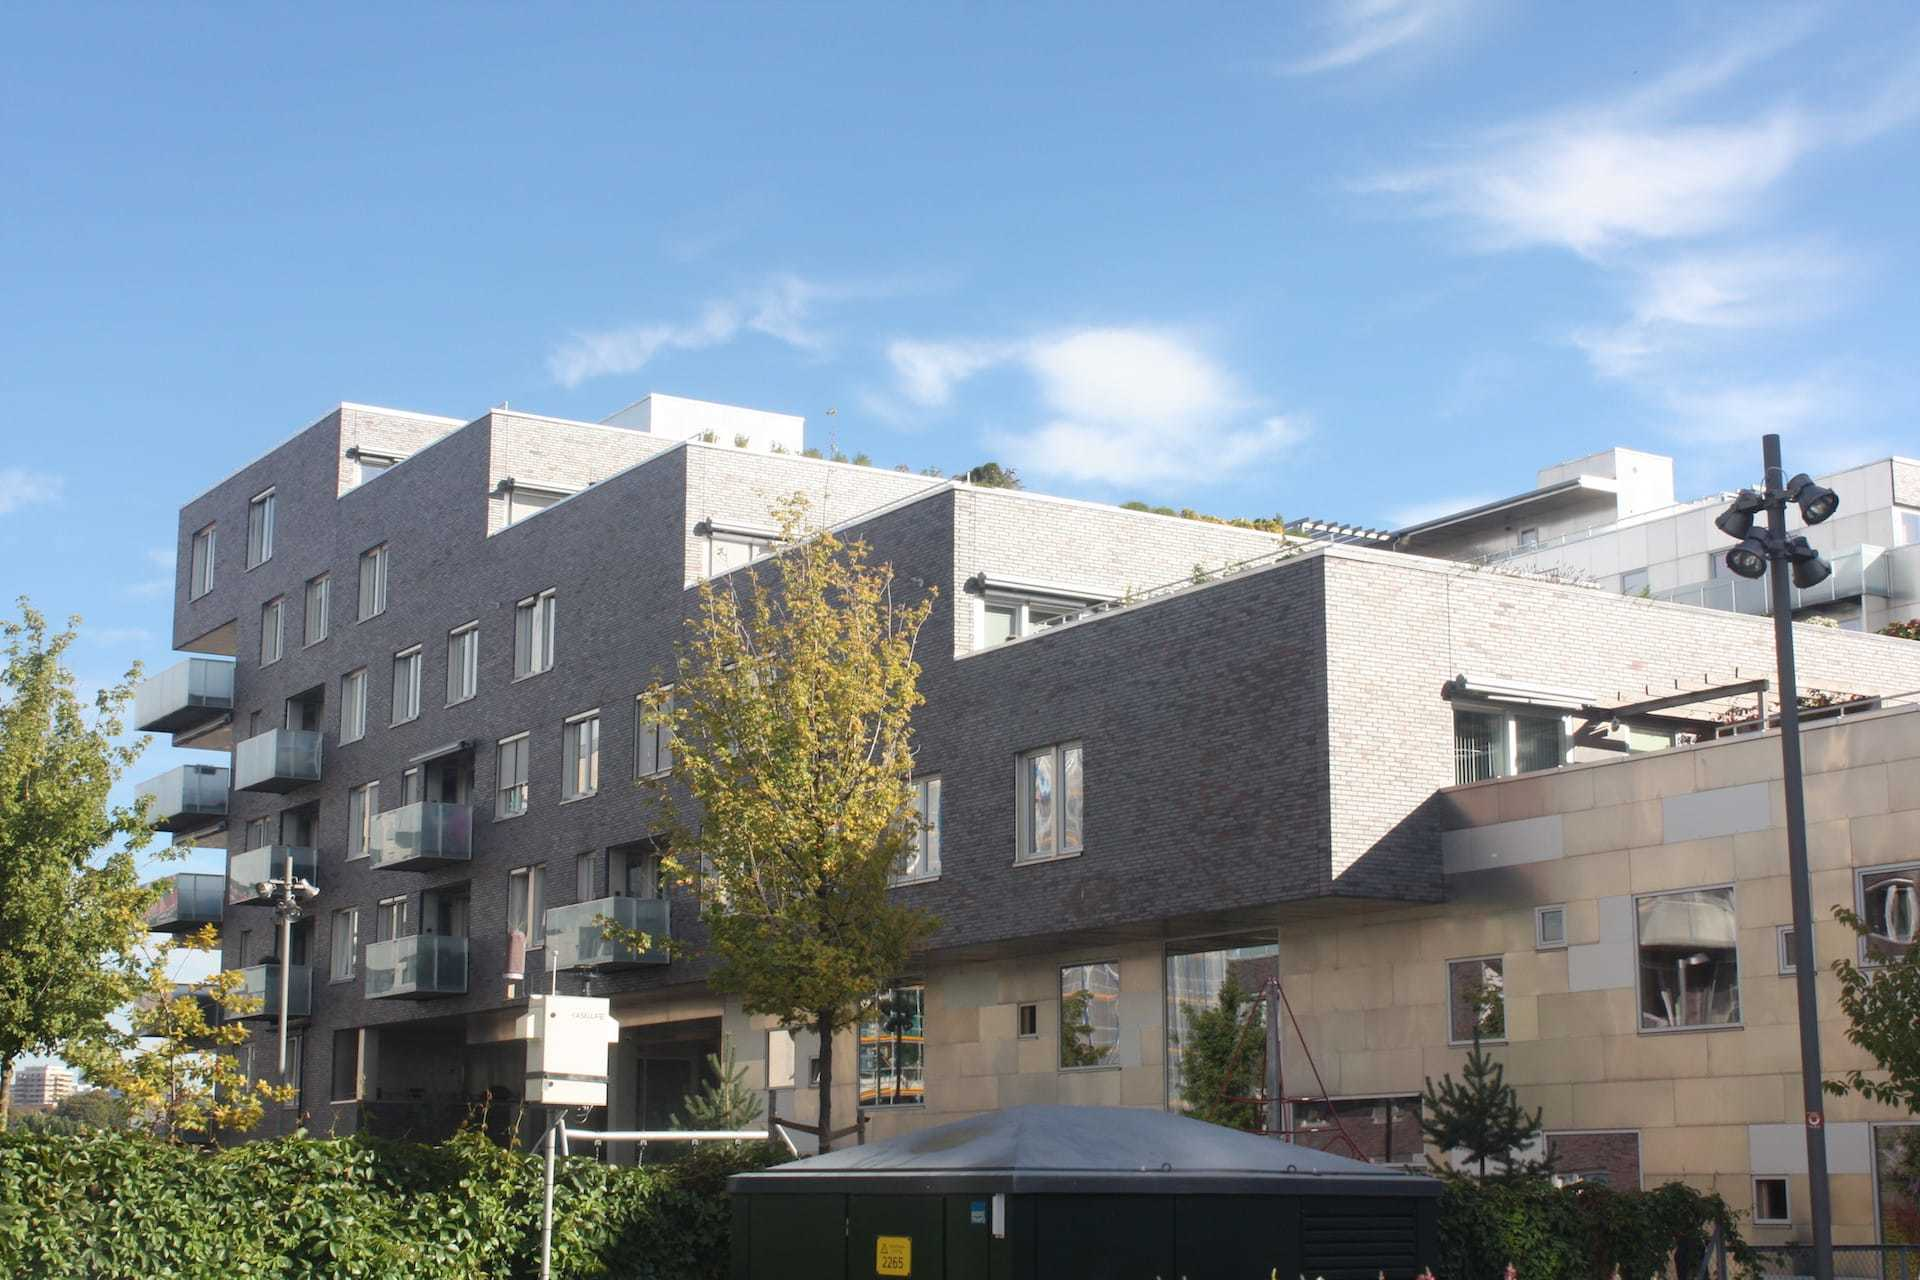 Sørengkaia Byggetrinn 3, Oslo